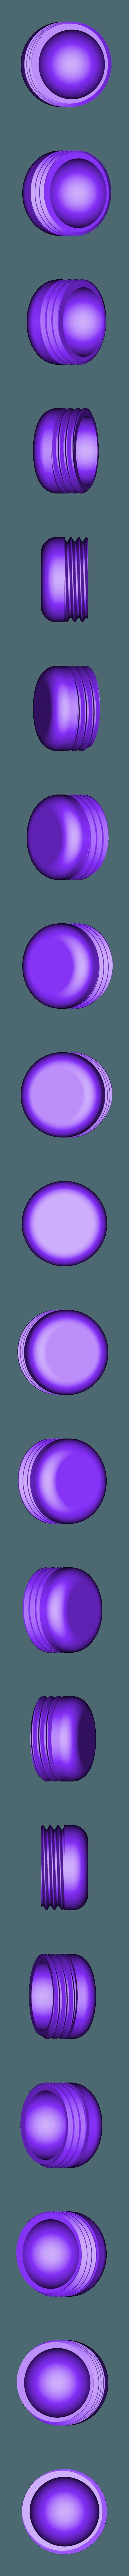 Ball_Bearing_Cap.stl Download free STL file Lady Buggy • 3D printer object, gzumwalt